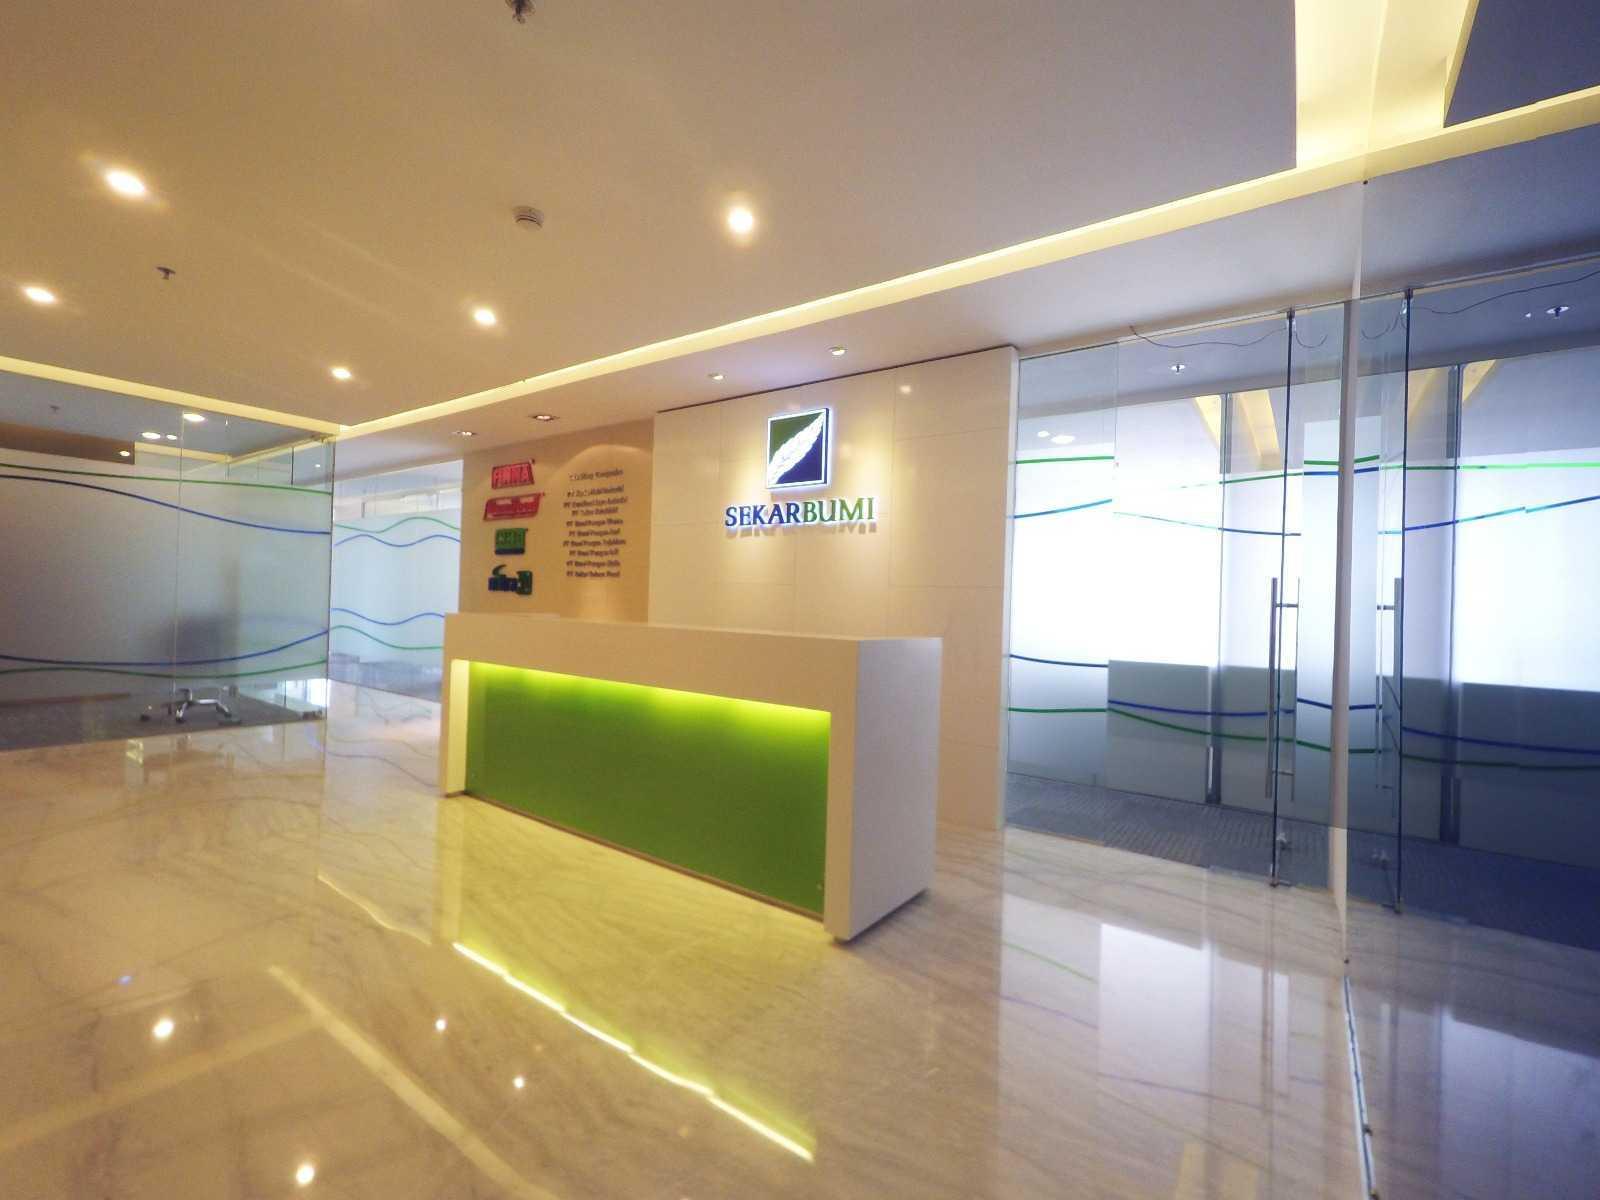 Arkadia Works Sekar Bumi Office Renovation Plaza Asia 21St Floor Plaza Asia 21St Floor Reception Area   14075